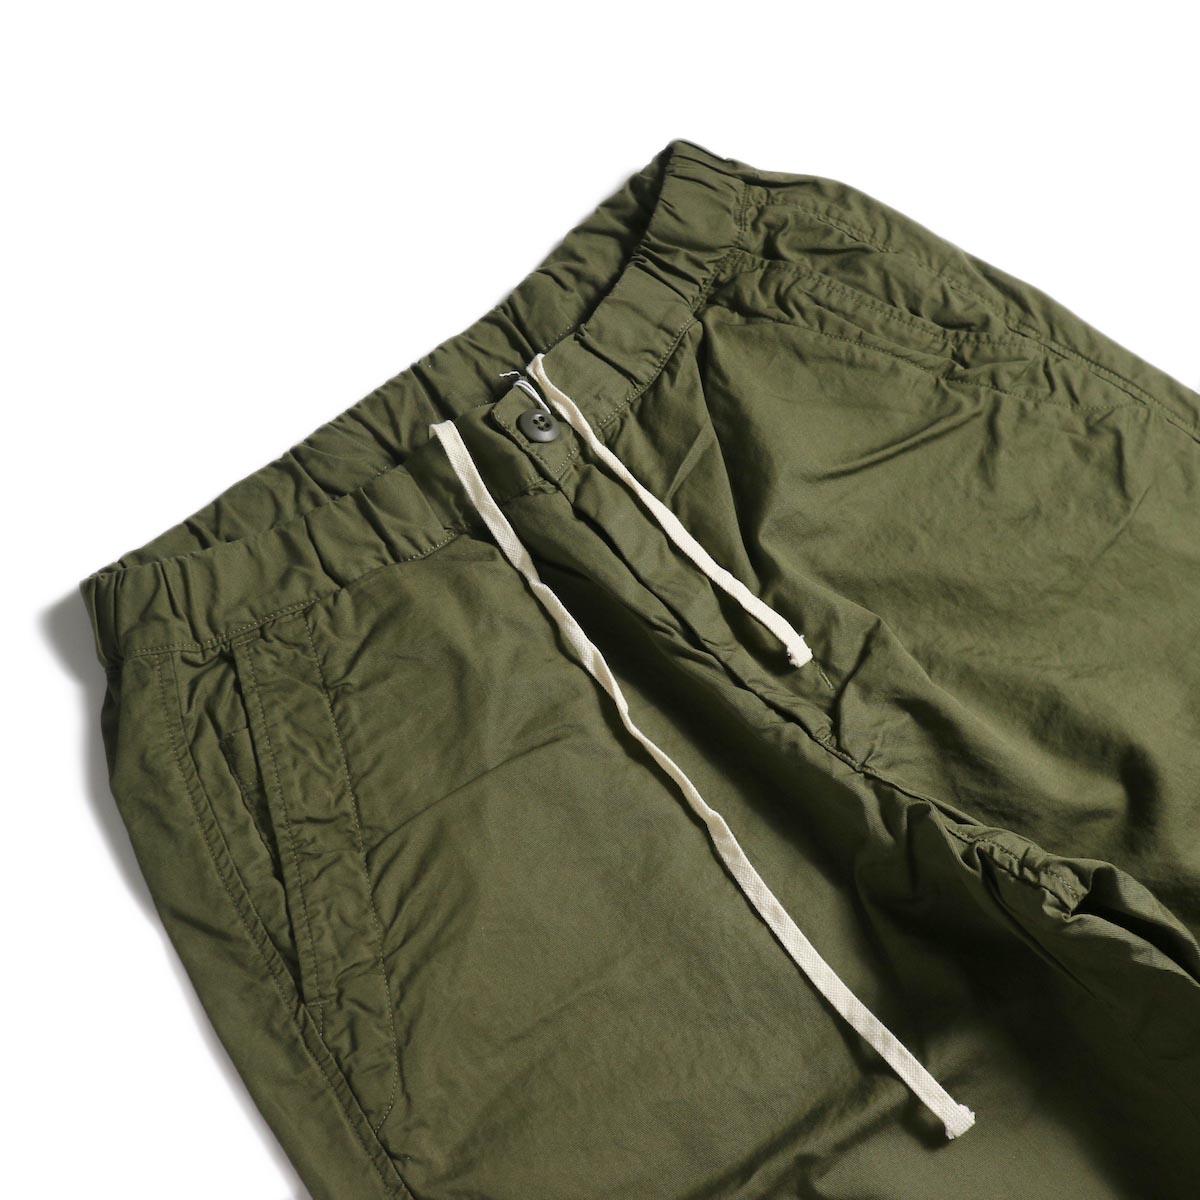 BRENA / Cotton&Linen Washer Kersey Coq Pants (Amg)ウエスト